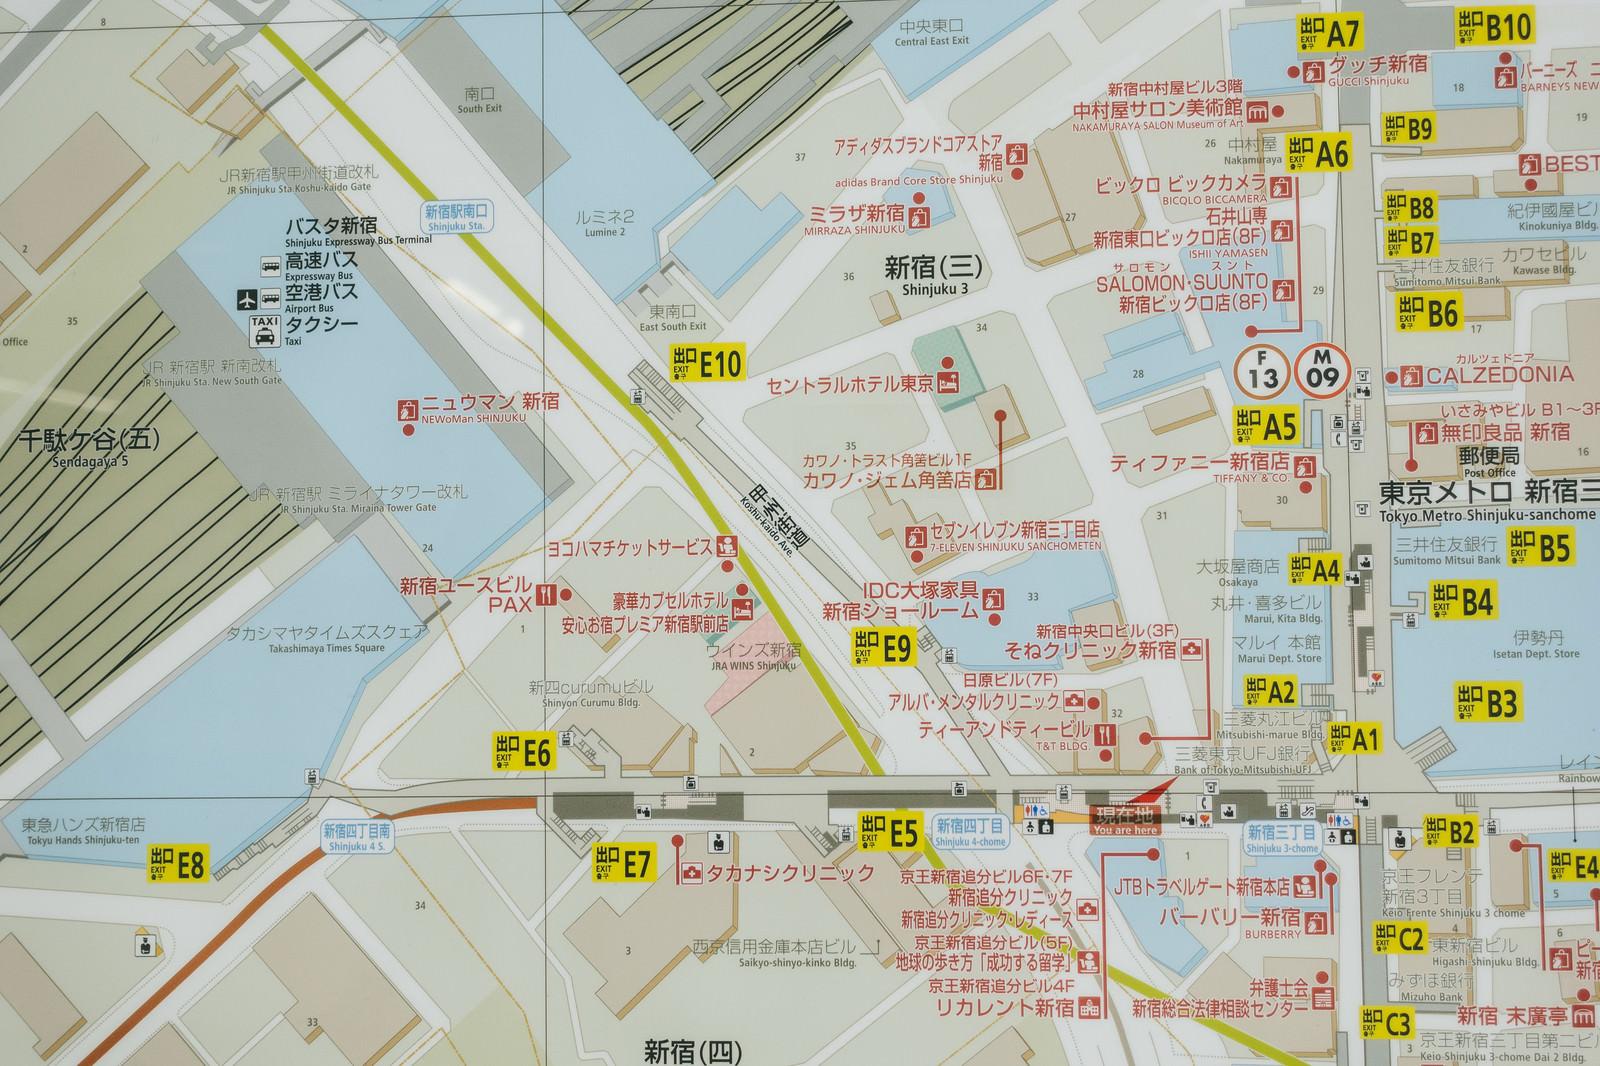 「新宿三丁目駅周辺のMAP新宿三丁目駅周辺のMAP」のフリー写真素材を拡大